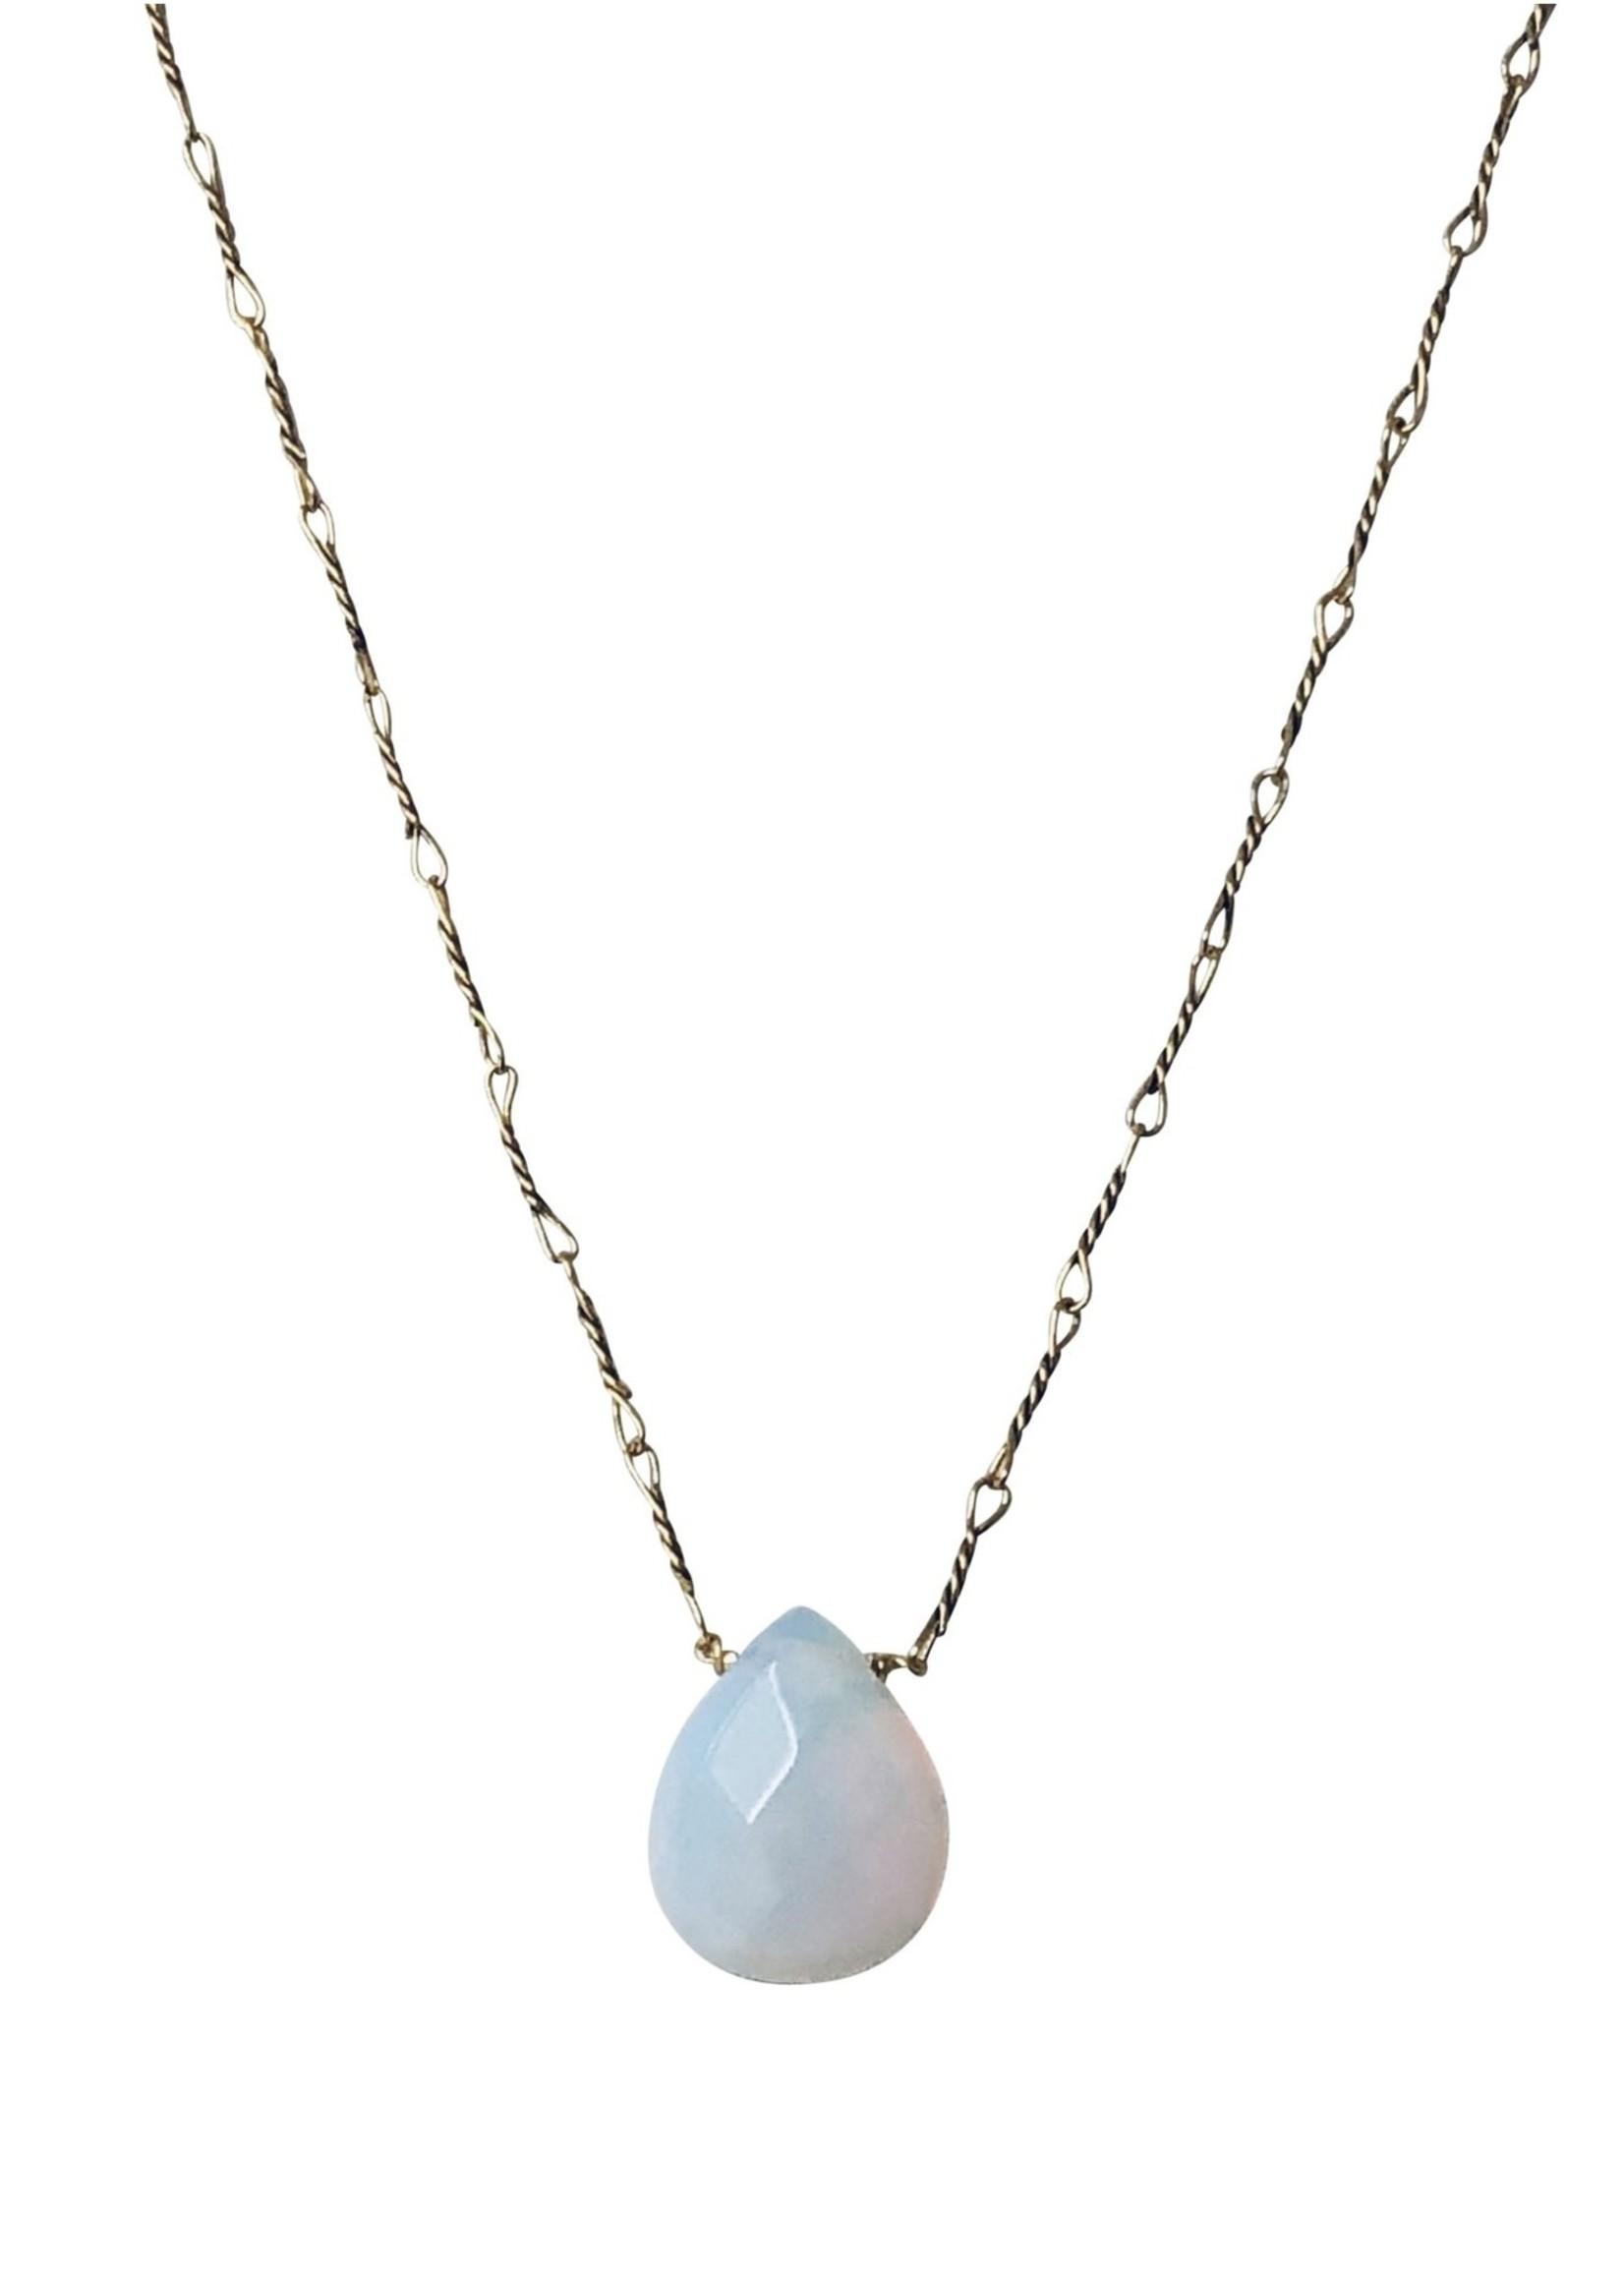 Churro Opalite Necklace